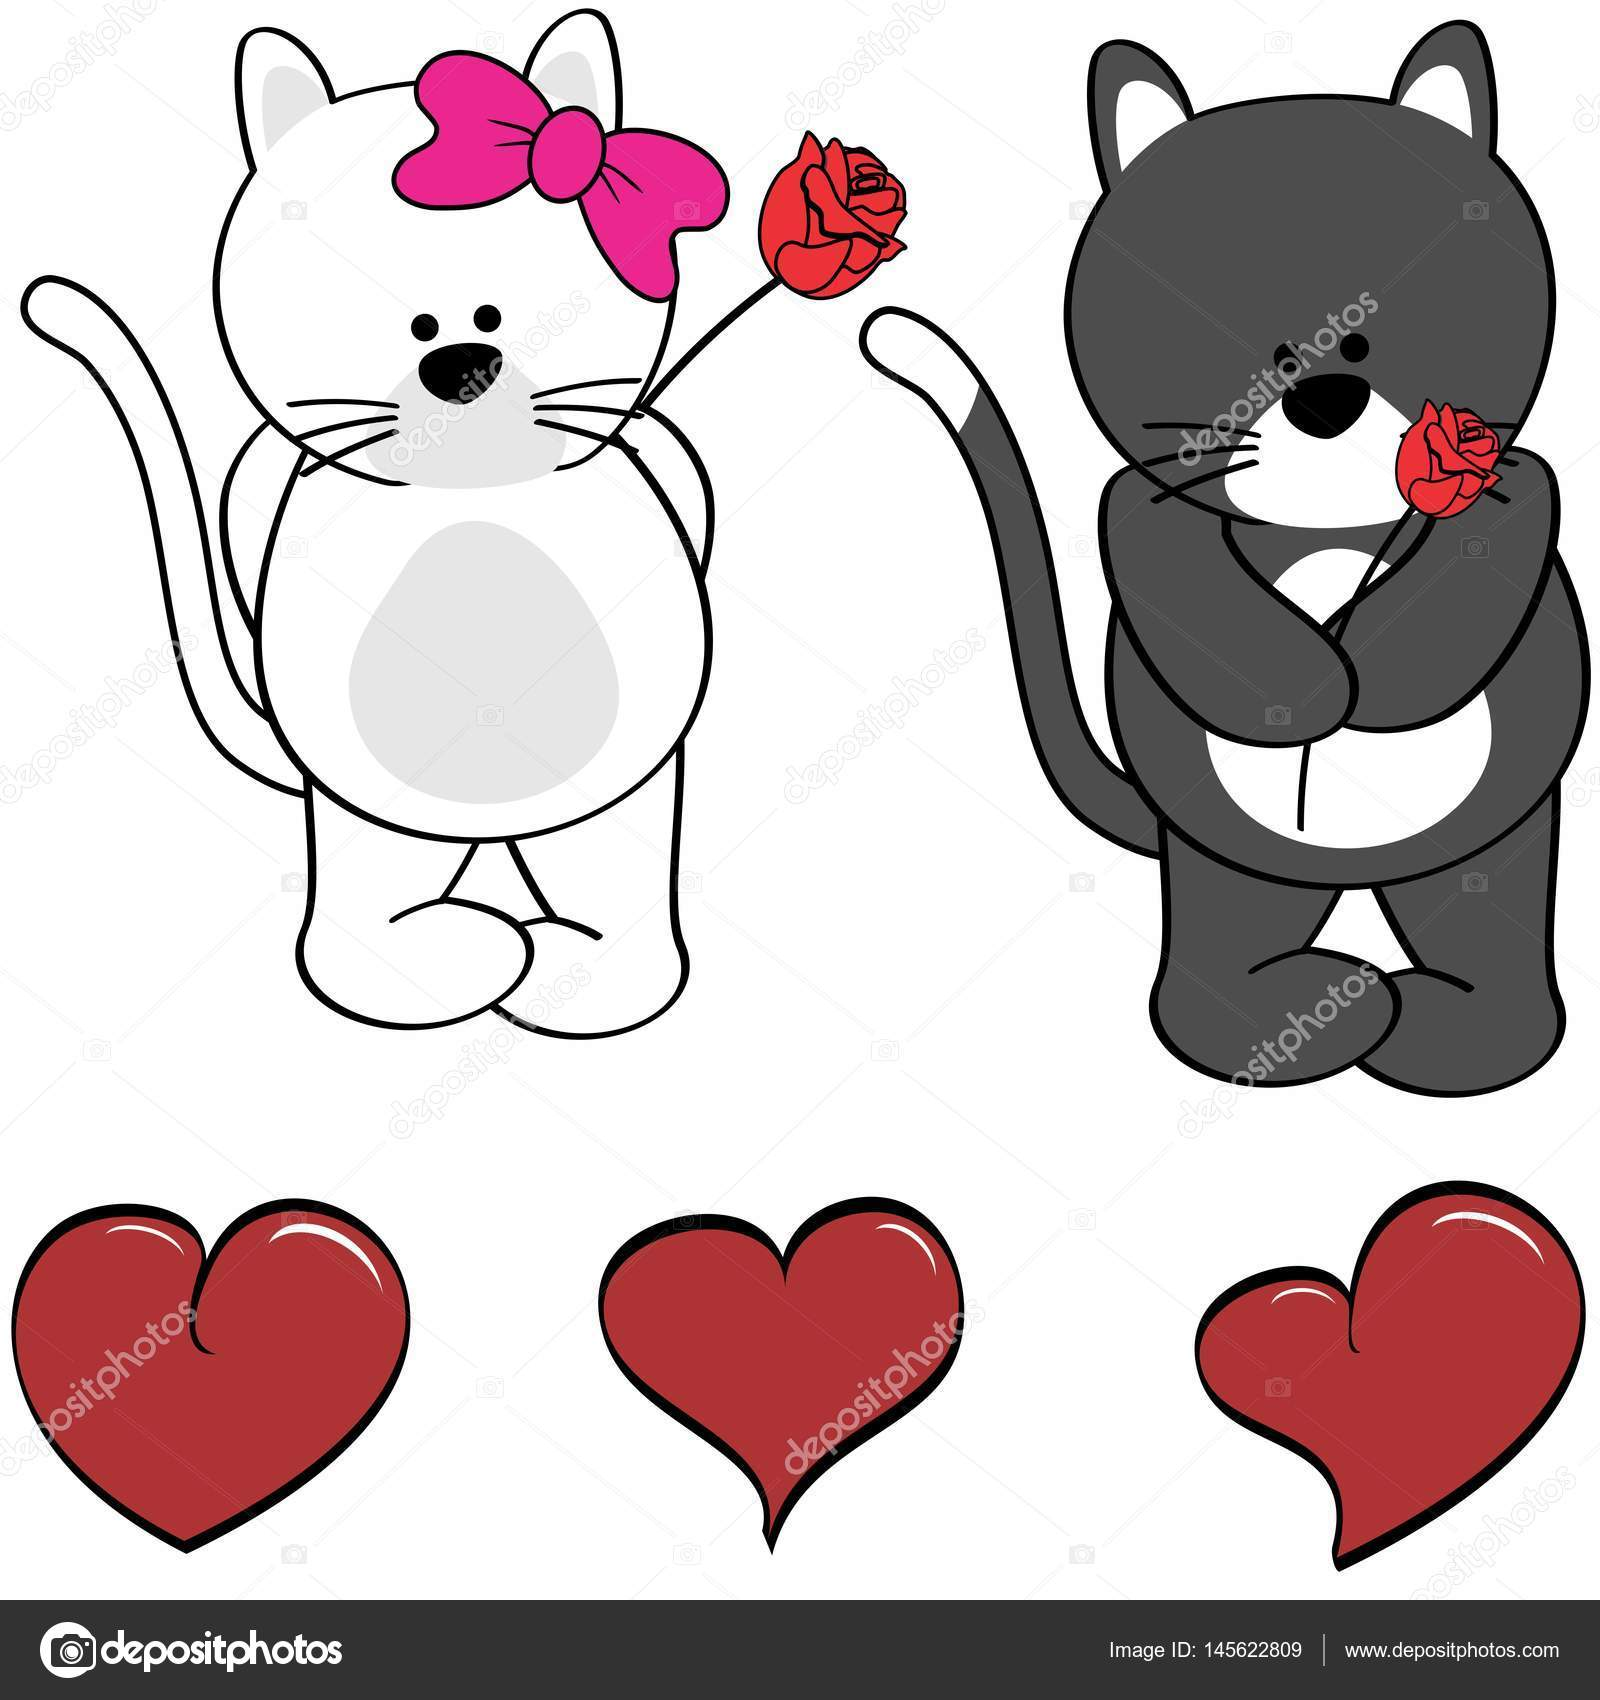 Dibujos Corazón Bonitos Lindo Gato De Dibujos Animados Amor